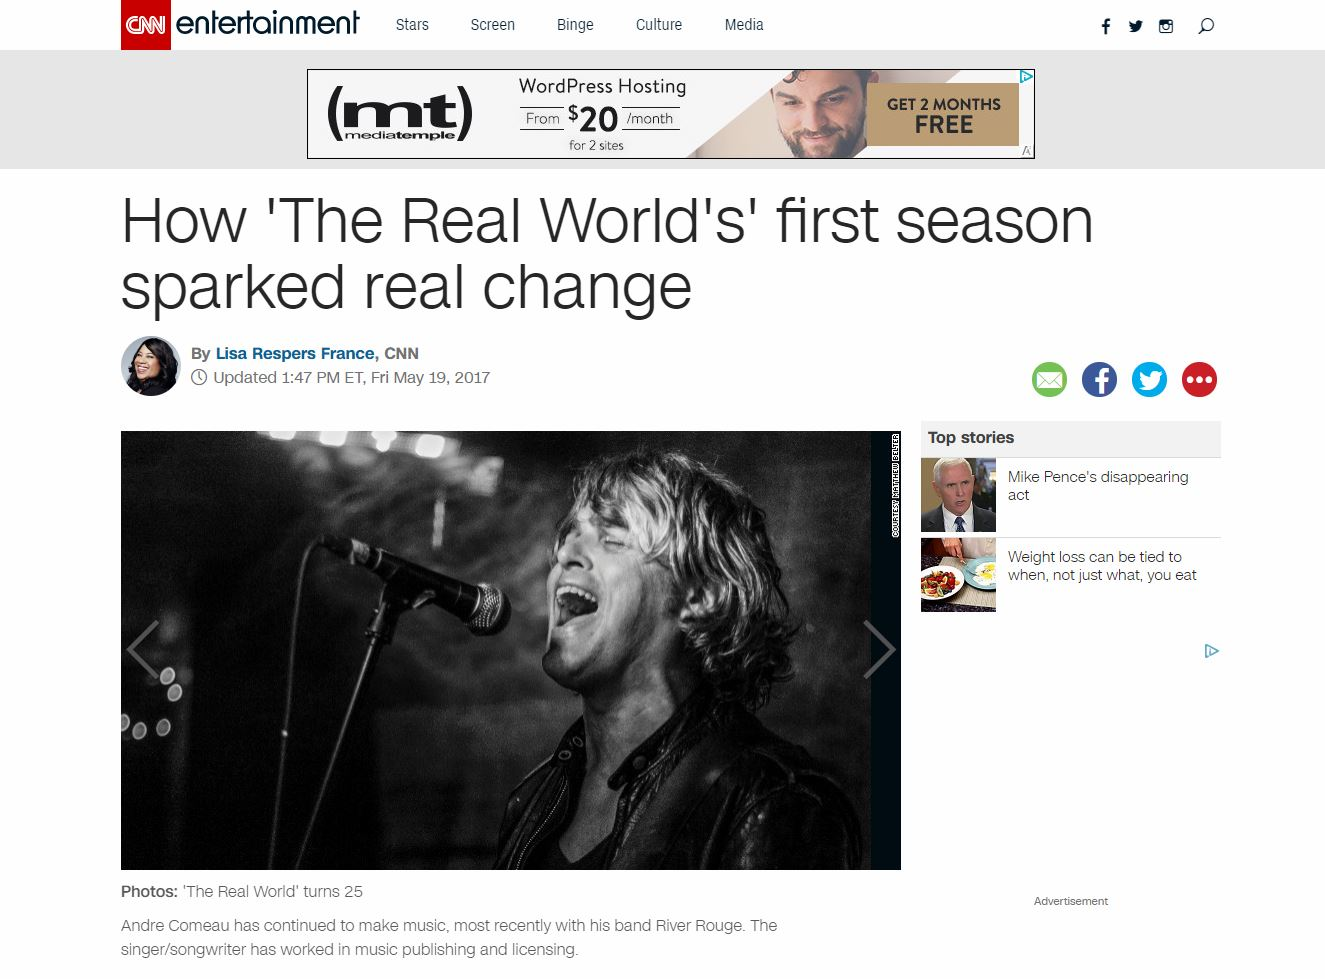 """The Real World's First Season"" - CNN.Com (May 19, 2017)"